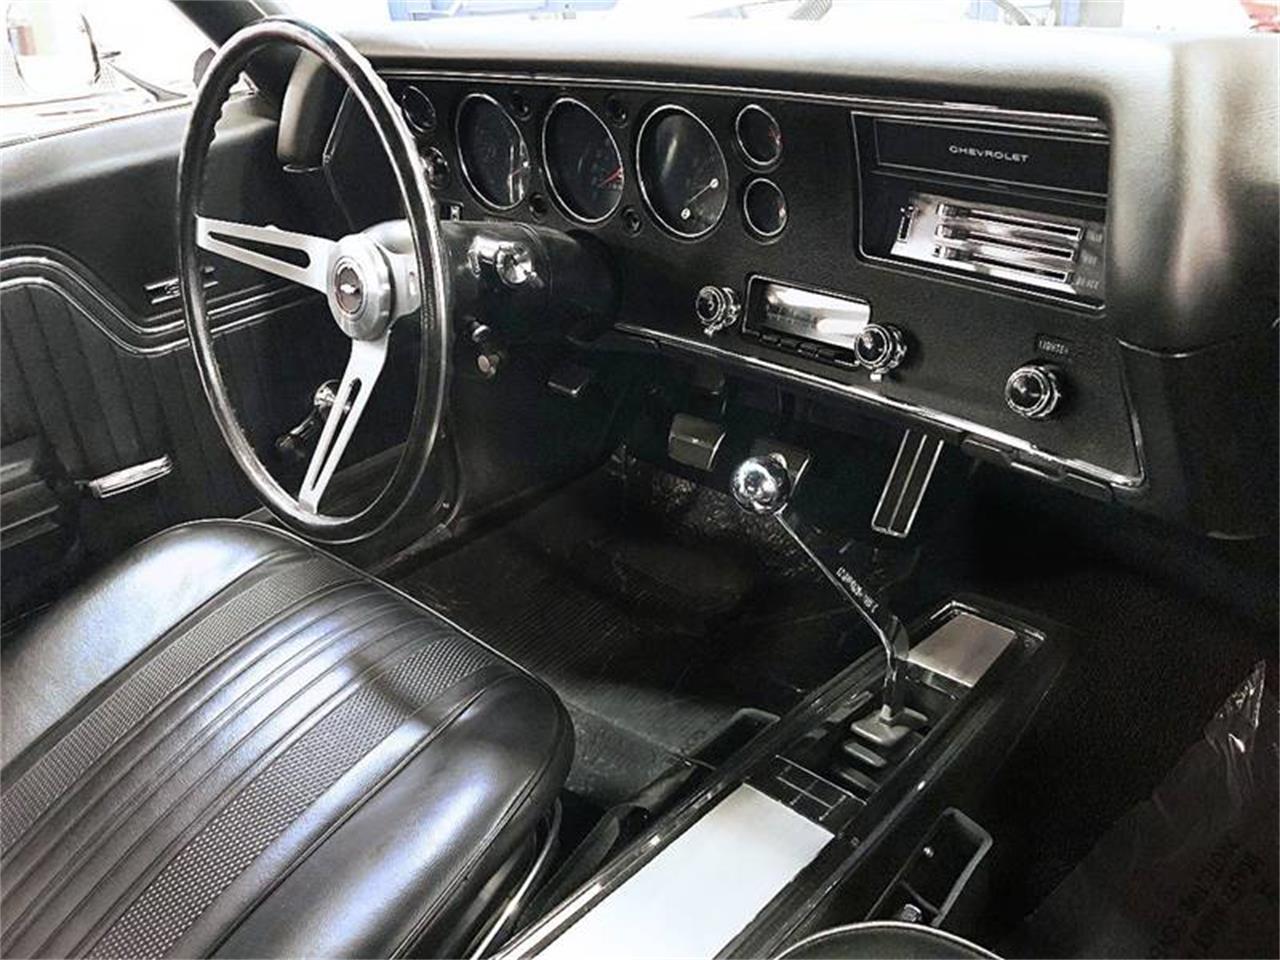 1970 Chevrolet Chevelle (CC-1272133) for sale in Burr Ridge, Illinois